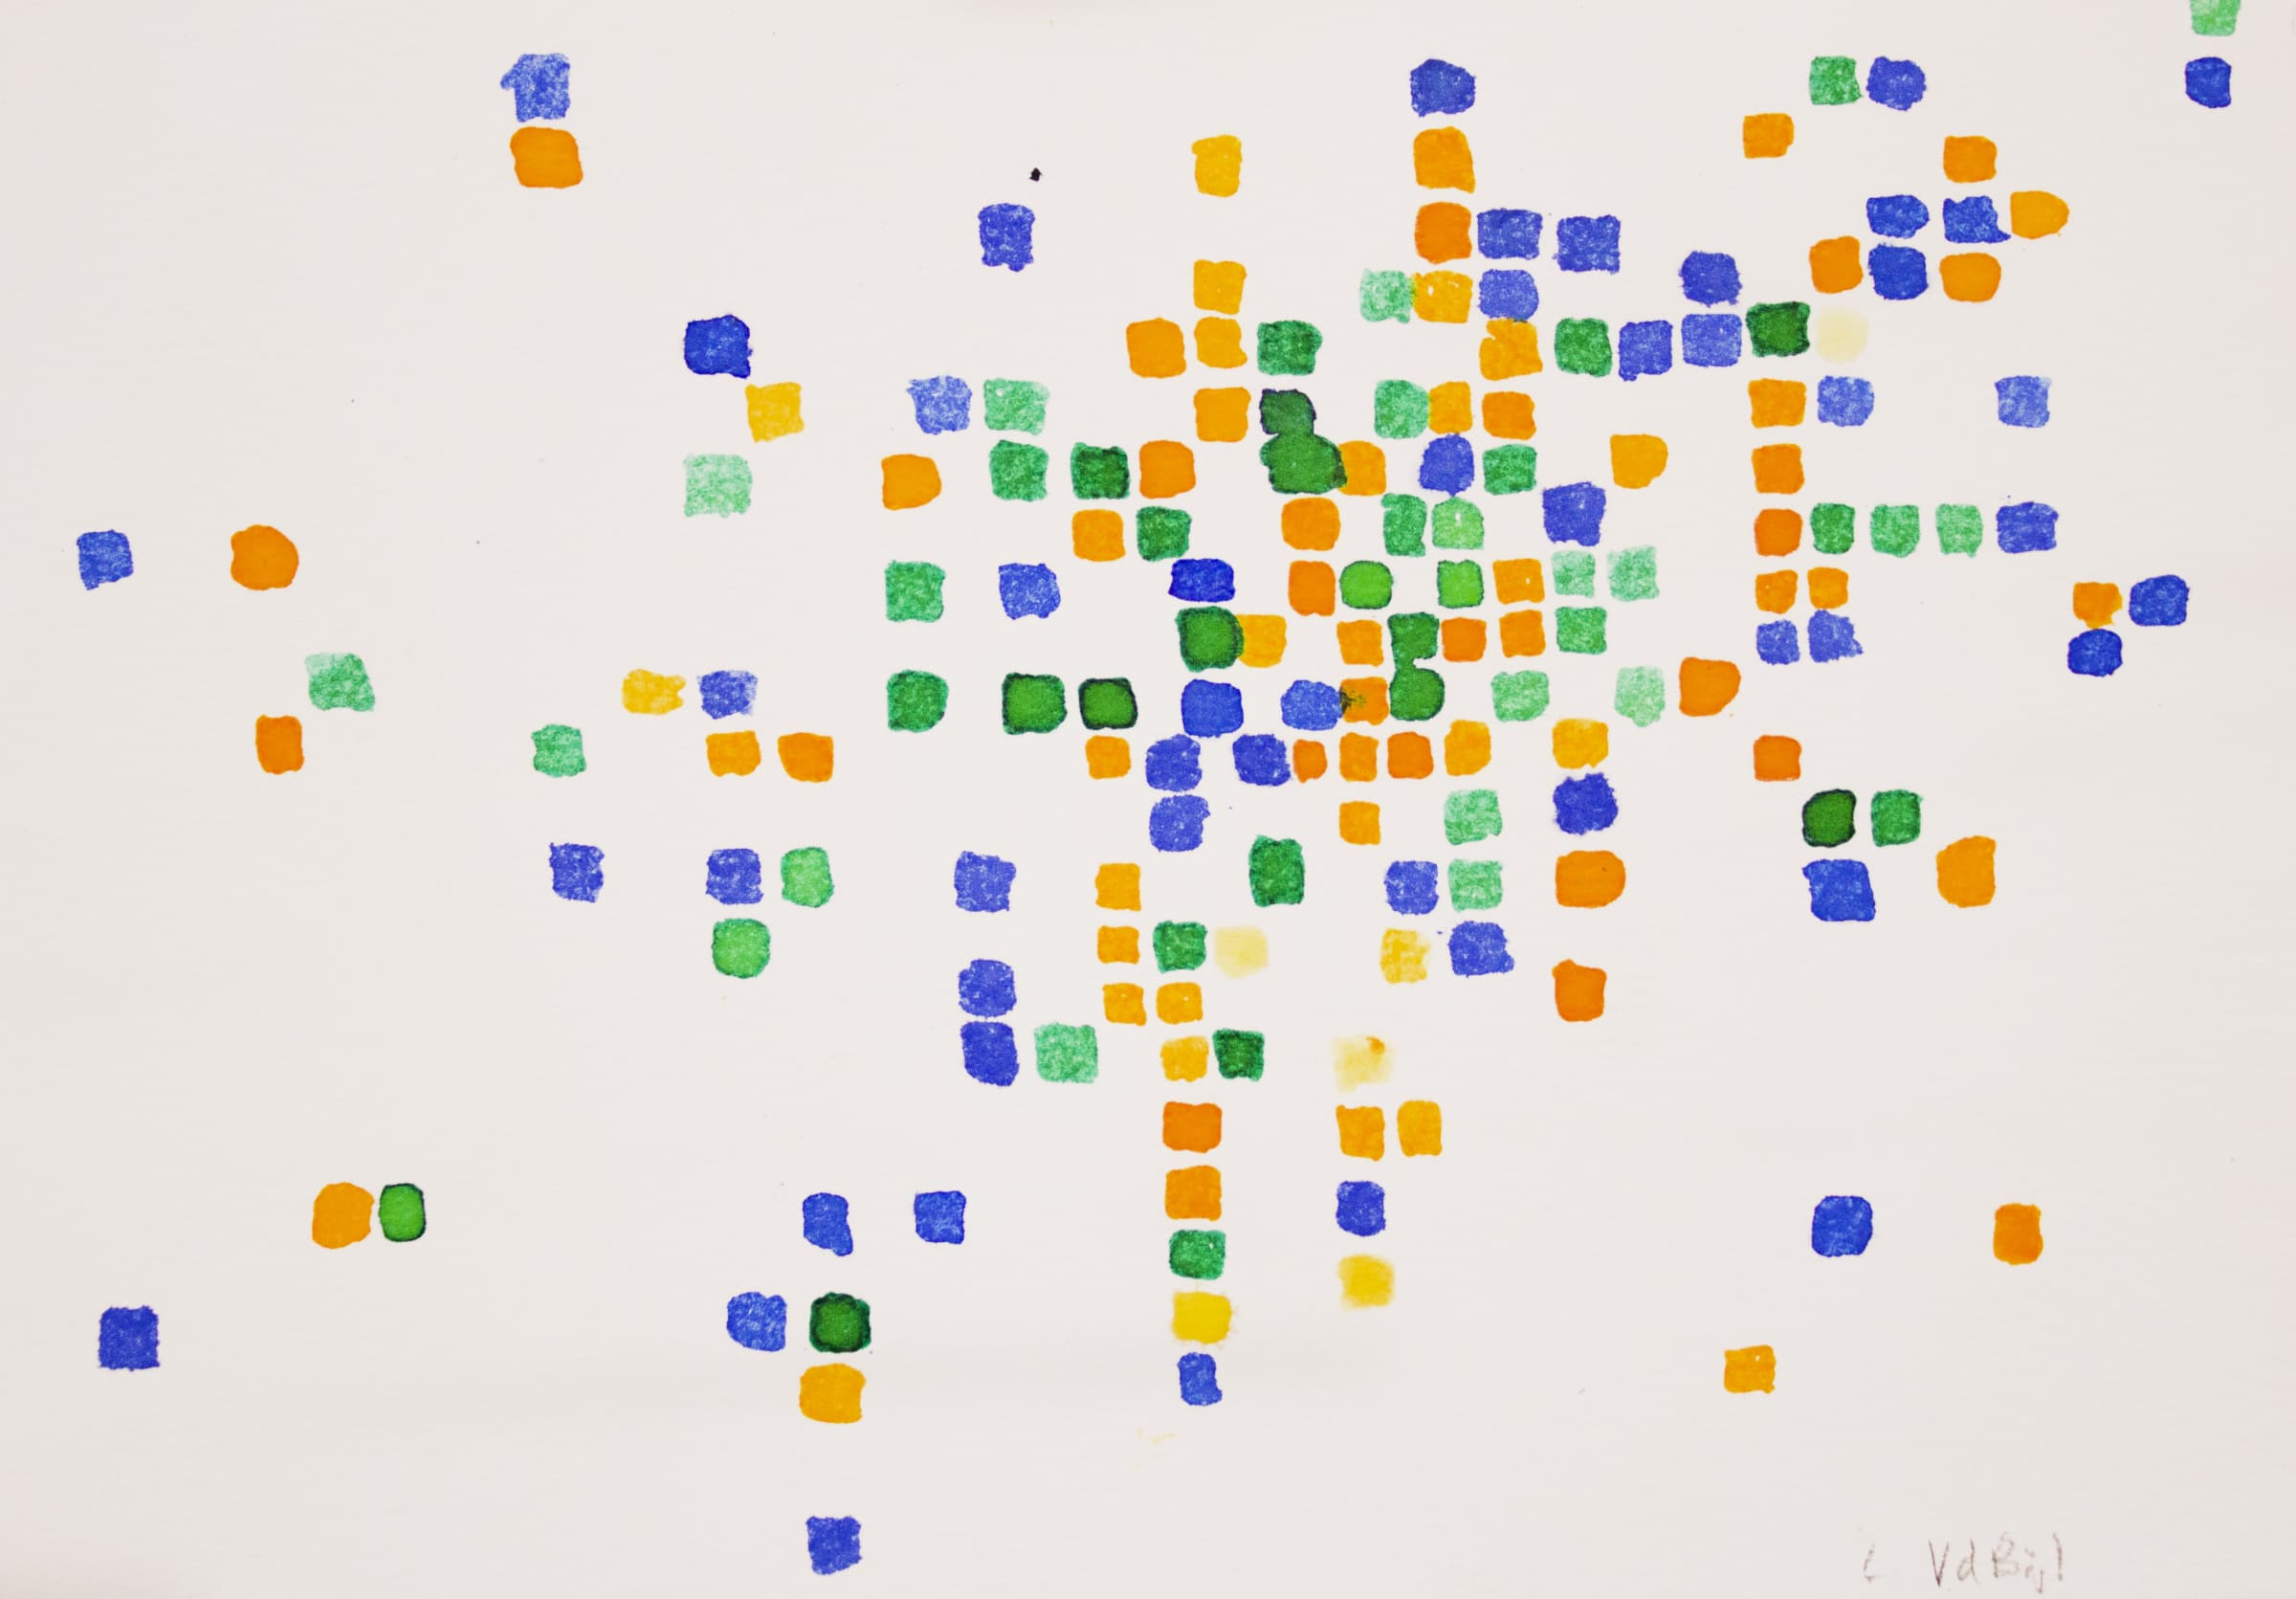 <span class=&#34;link fancybox-details-link&#34;><a href=&#34;/artists/88-louise-van-der-bijl/works/2284-louise-van-der-bijl-inktober-day-21-2018/&#34;>View Detail Page</a></span><div class=&#34;artist&#34;><strong>Louise Van Der Bijl</strong></div> <div class=&#34;title&#34;><em>Inktober Day 21</em>, 2018</div> <div class=&#34;medium&#34;>Ink On Paper</div> <div class=&#34;dimensions&#34;>15.1cm x 21.3cm</div><div class=&#34;price&#34;>R400.00</div>